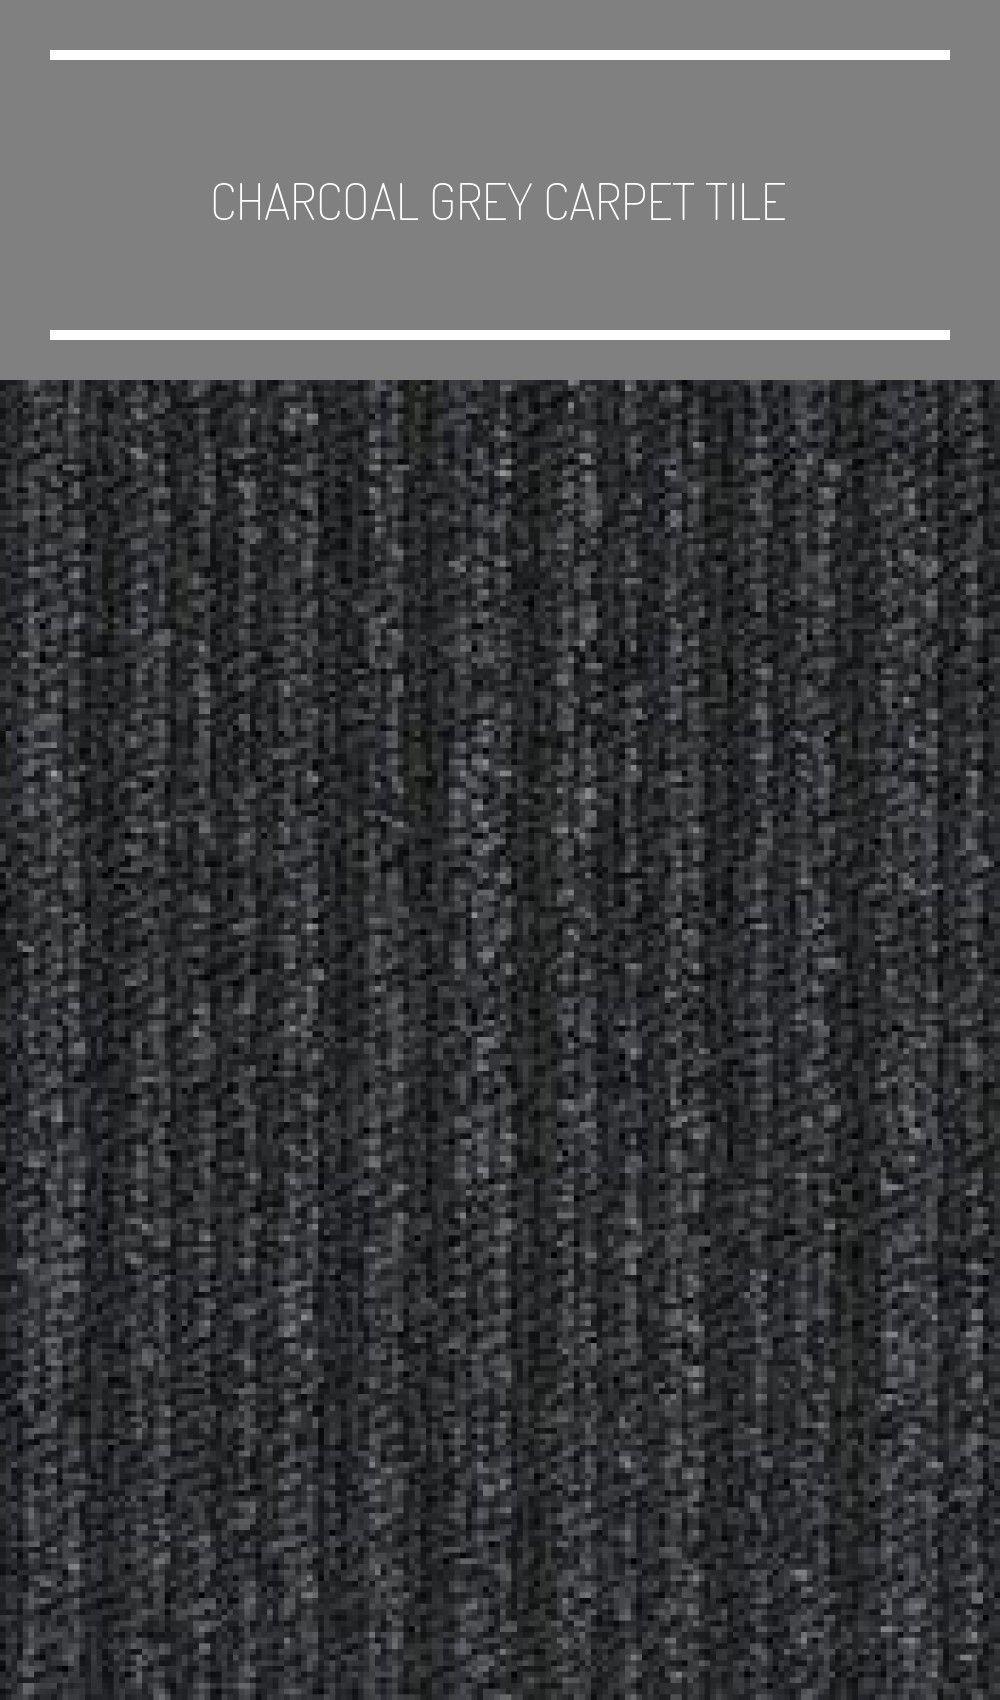 Charcoal Grey Carpet Tiles Dark Gray Carpet Office Charcoal Grey Carpet Tiles Dark Gray Carpet Office Car In 2020 Textured Carpet Charcoal Grey Carpet Grey Carpet